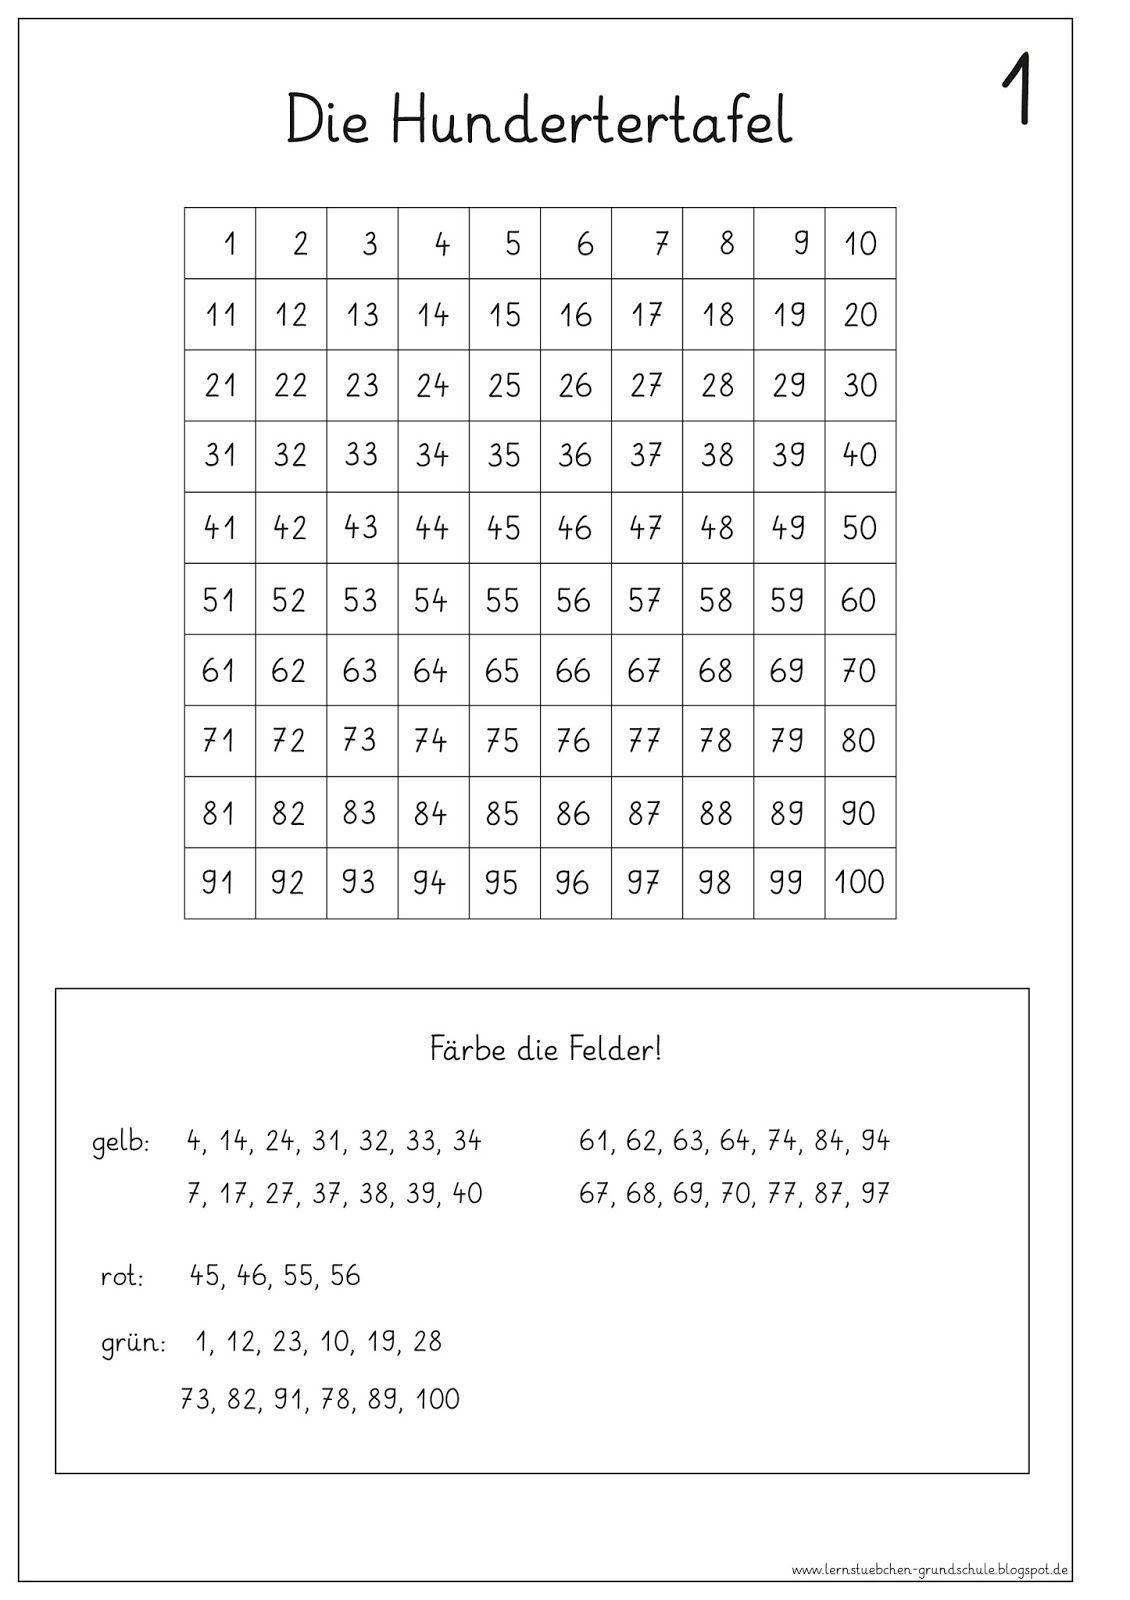 Hundertertafel Zum Ausdrucken Frau Locke : hundertertafel, ausdrucken, locke, Hundertertafel, Mathematikunterricht,, Mathe, Unterrichten,, Matheunterricht